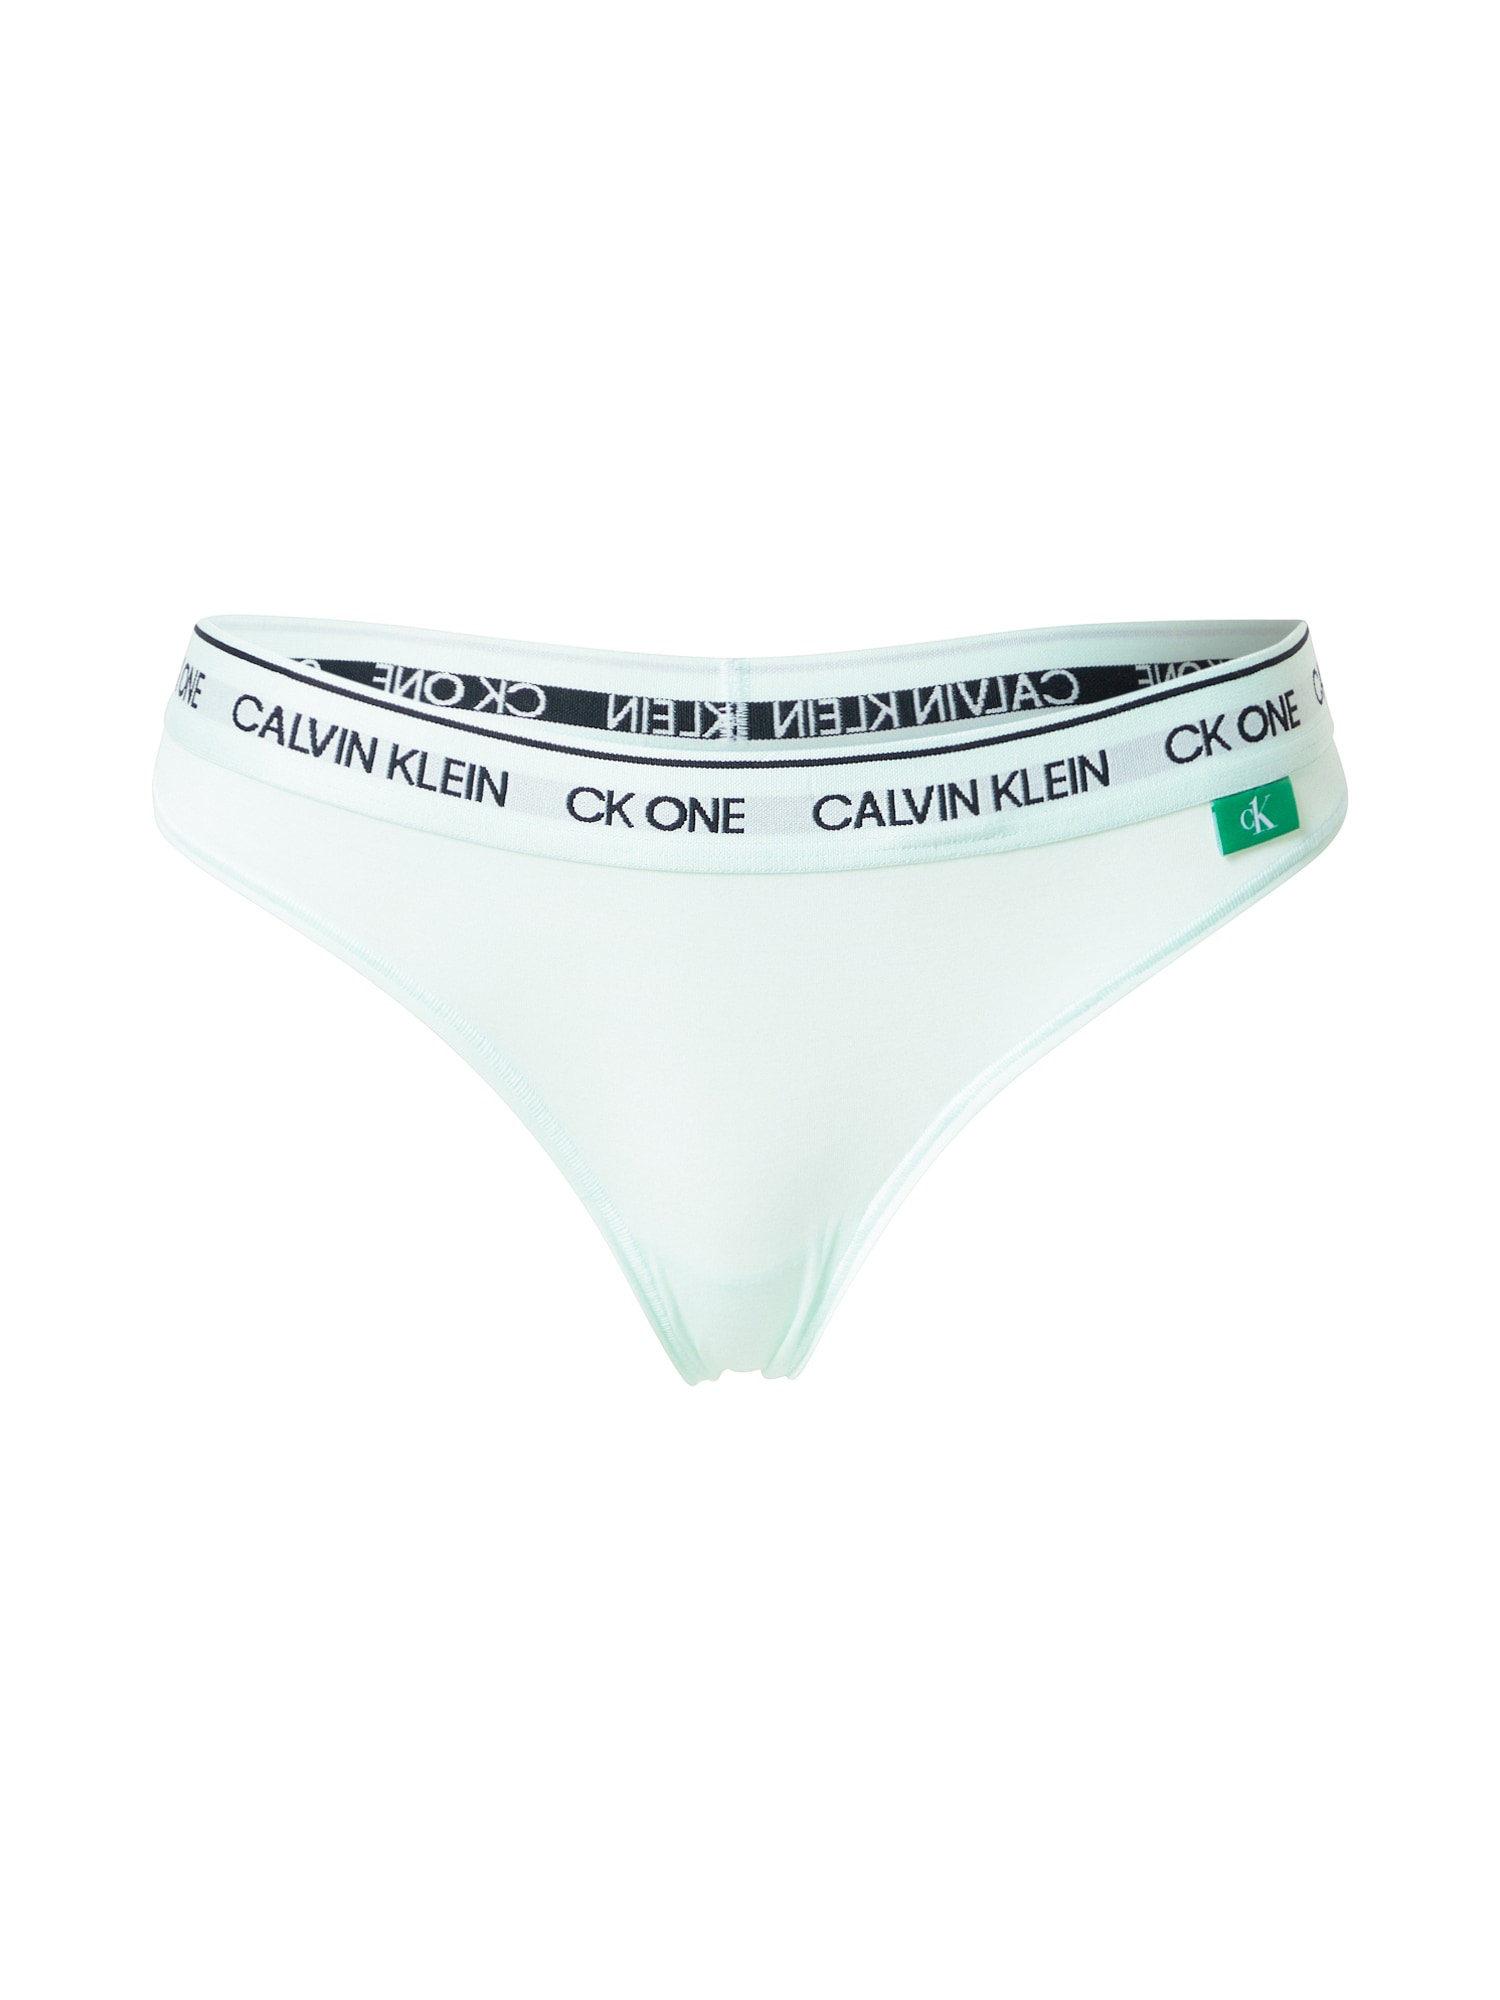 Calvin Klein Underwear Bikinio kelnaitės azuro / juoda